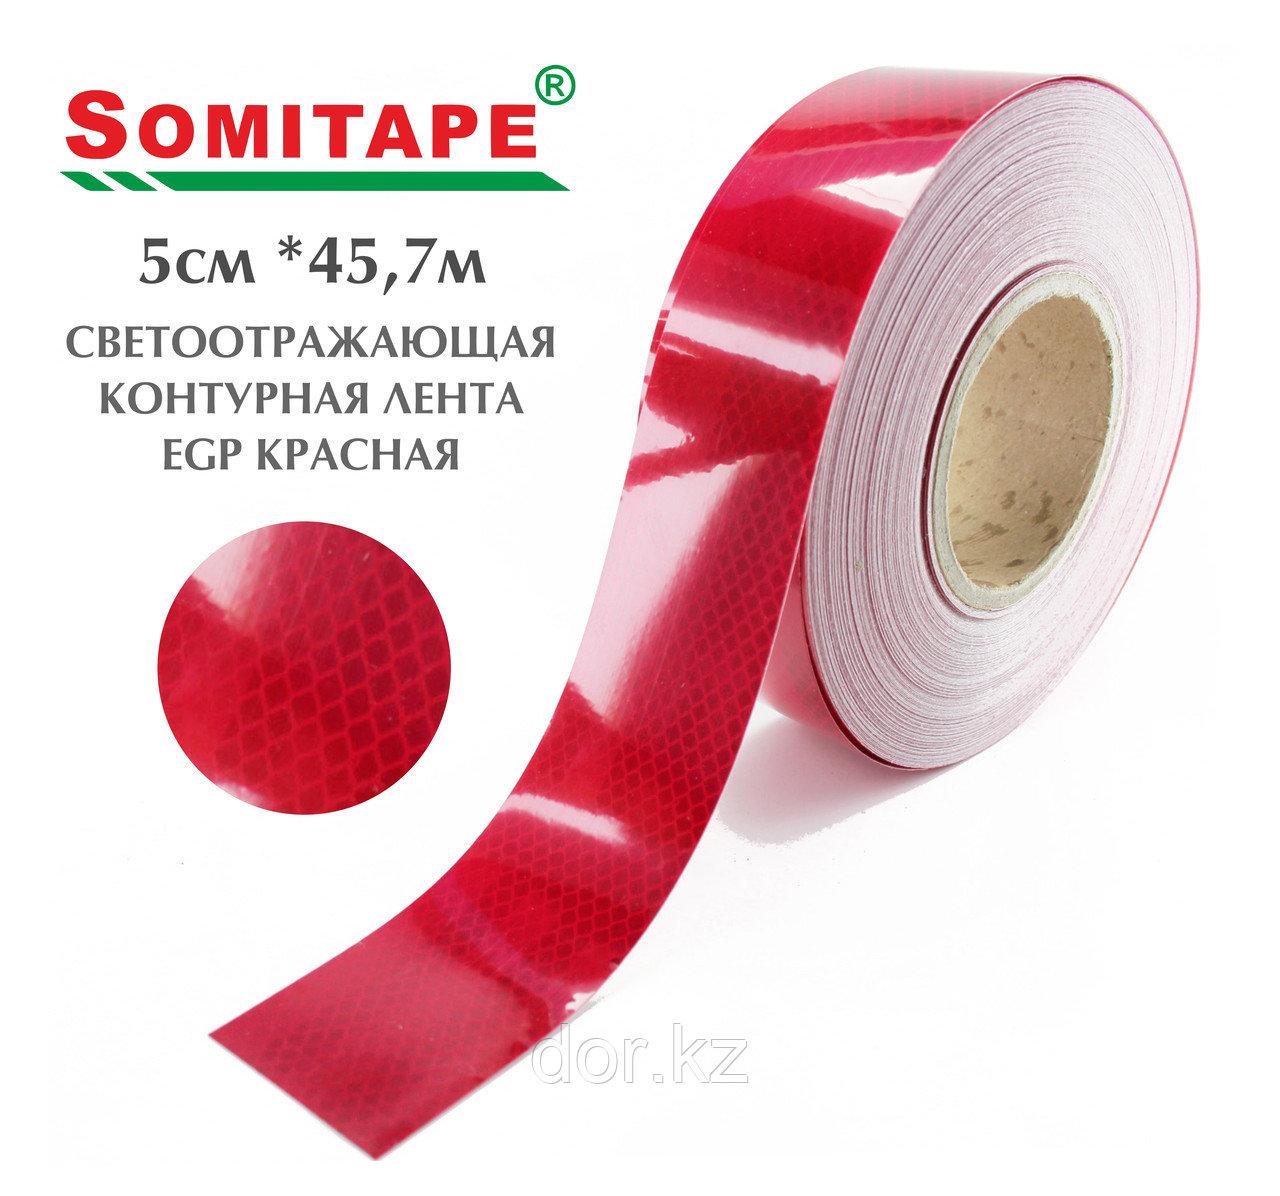 Светоотражающая контурная лента EGP красная (5смХ45,7м) +77079960093